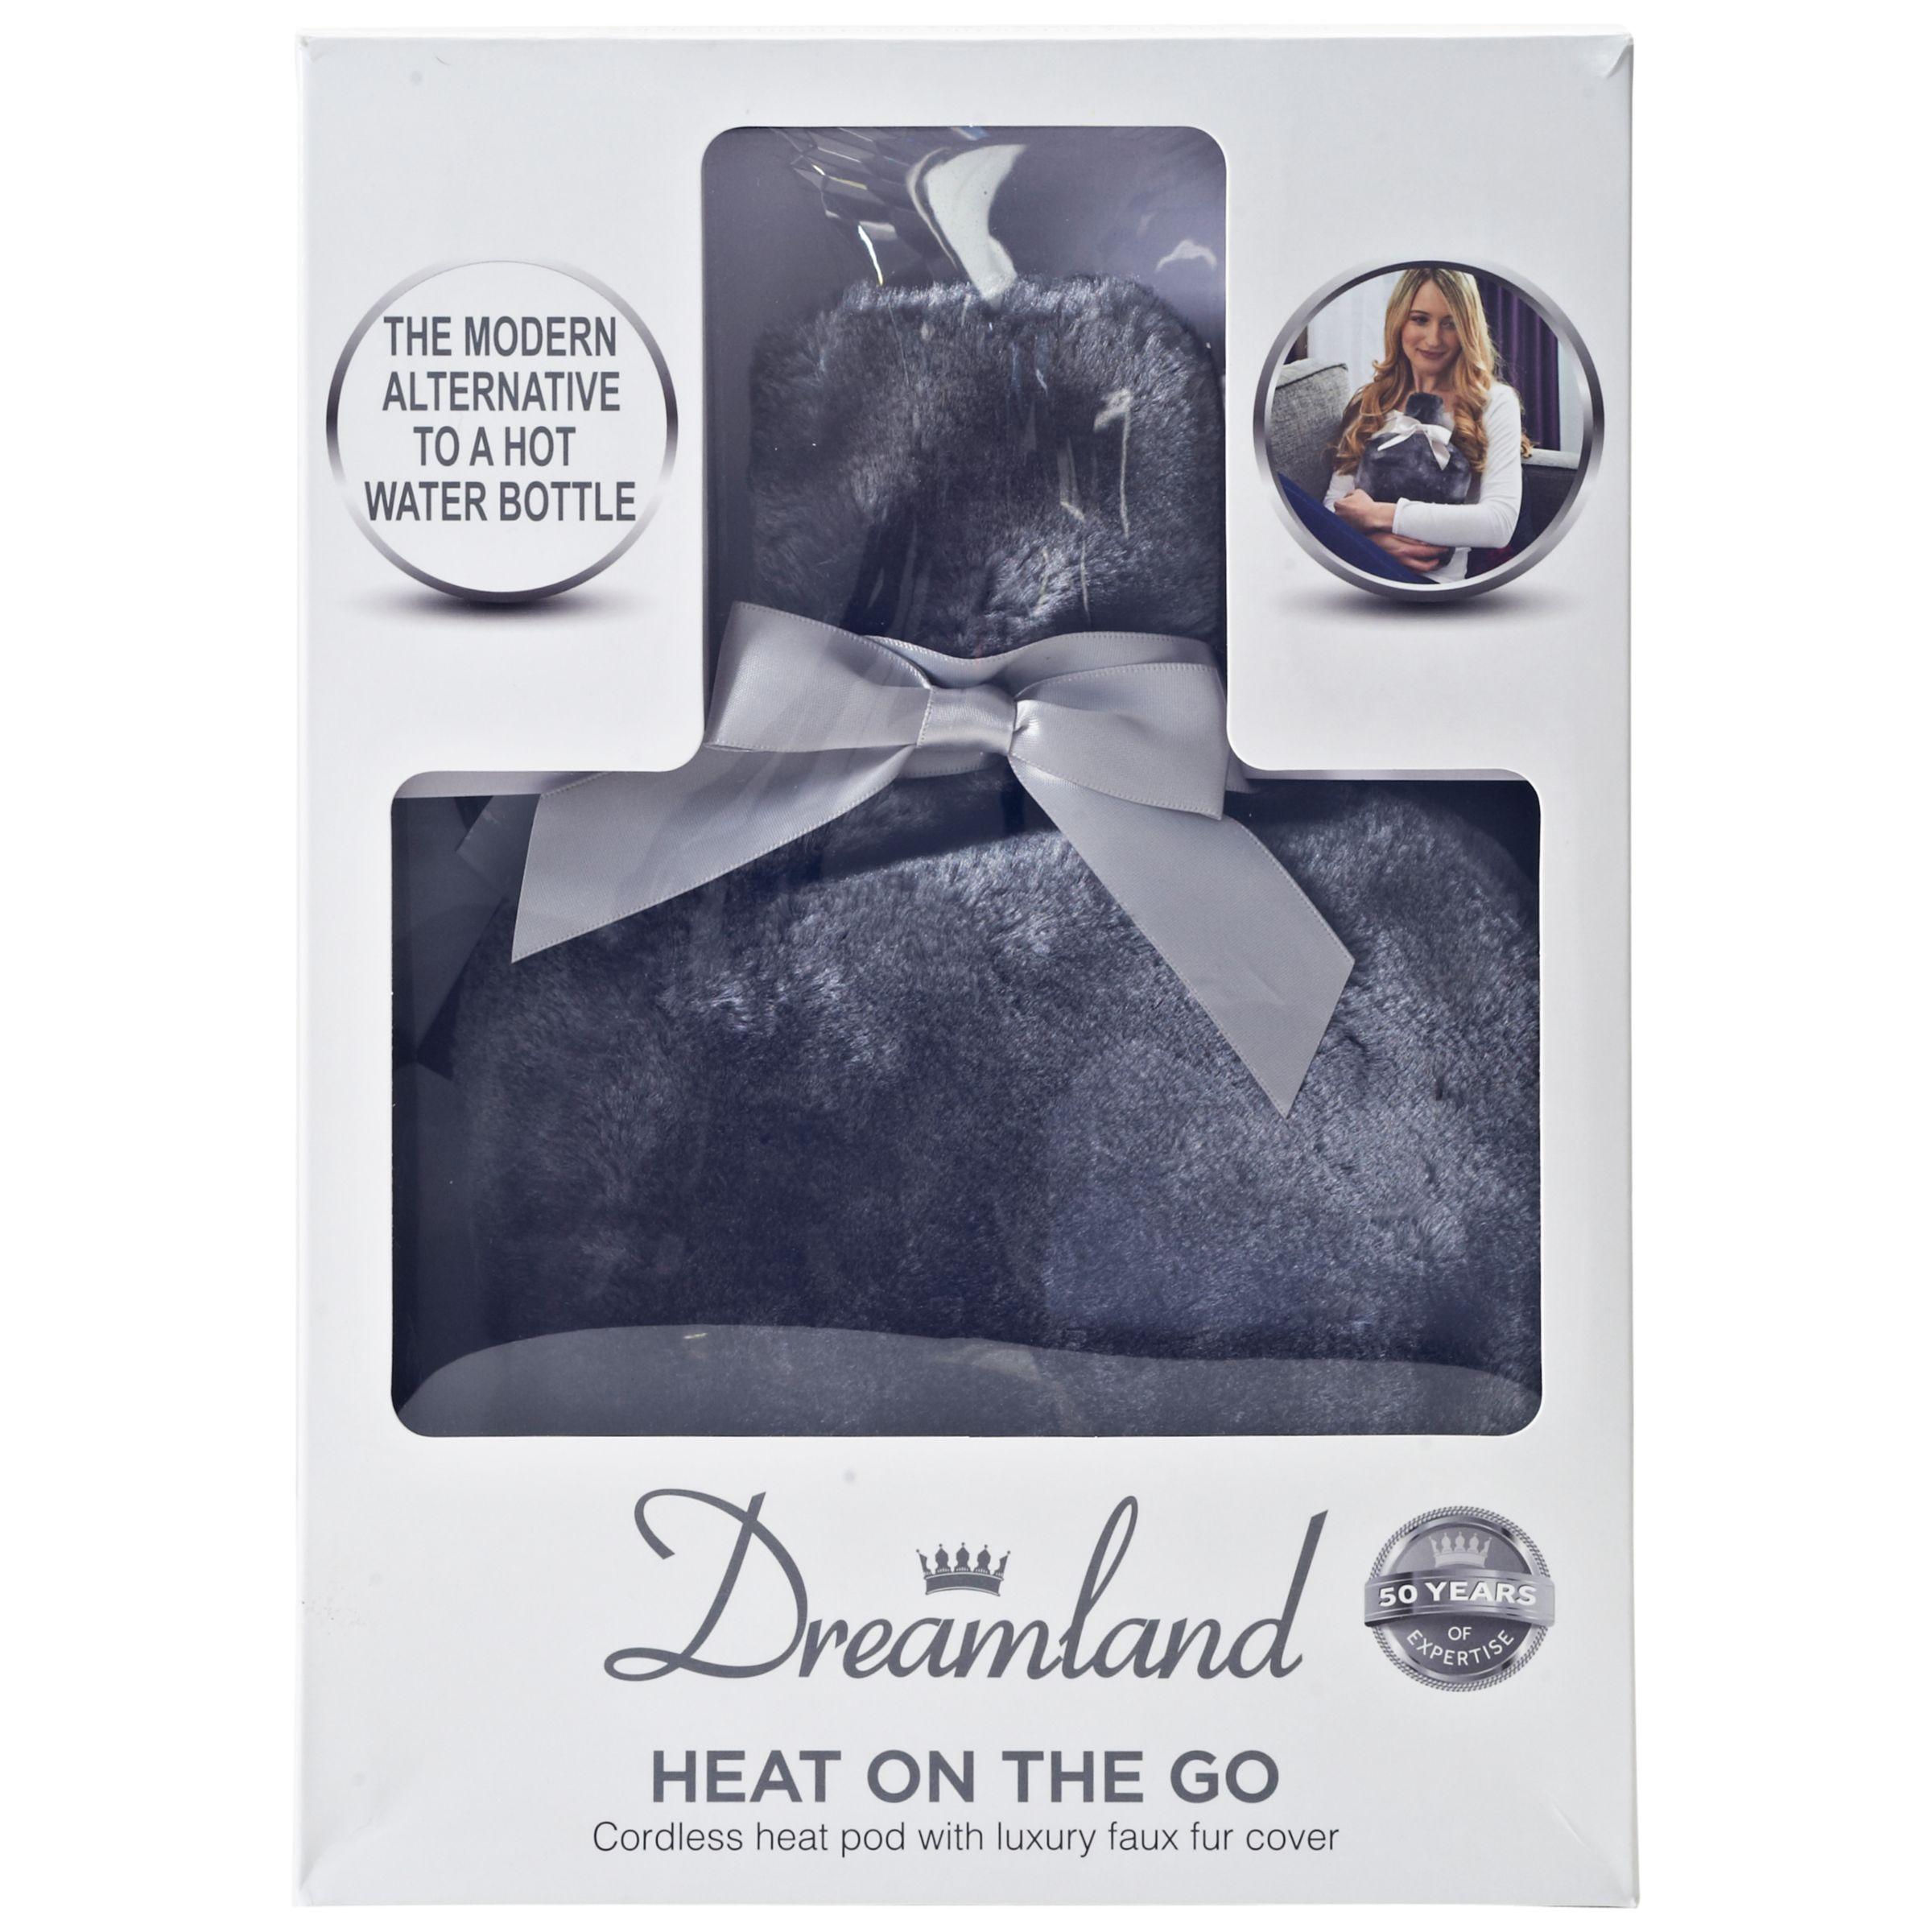 Dreamland Dreamland Heat On The Go Electric Heat Pod